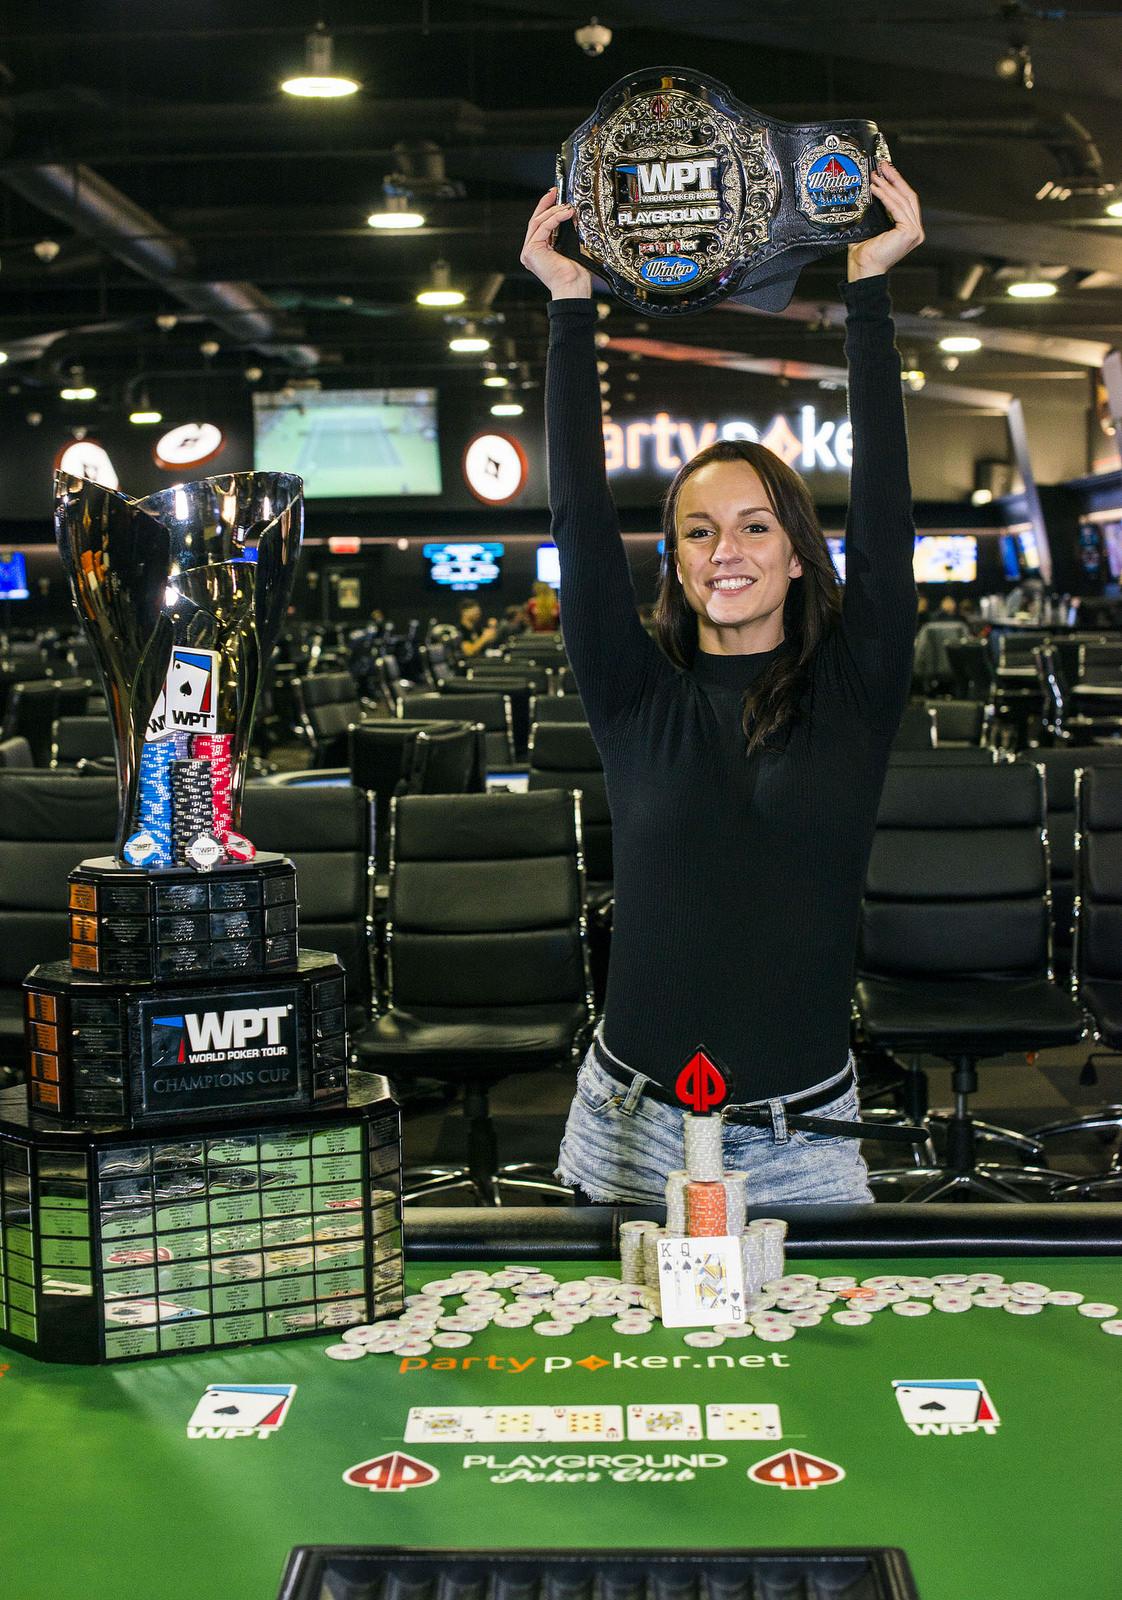 WPT Playground : Ema Zajmovic première gagnante d'un World Poker Tour ! 102